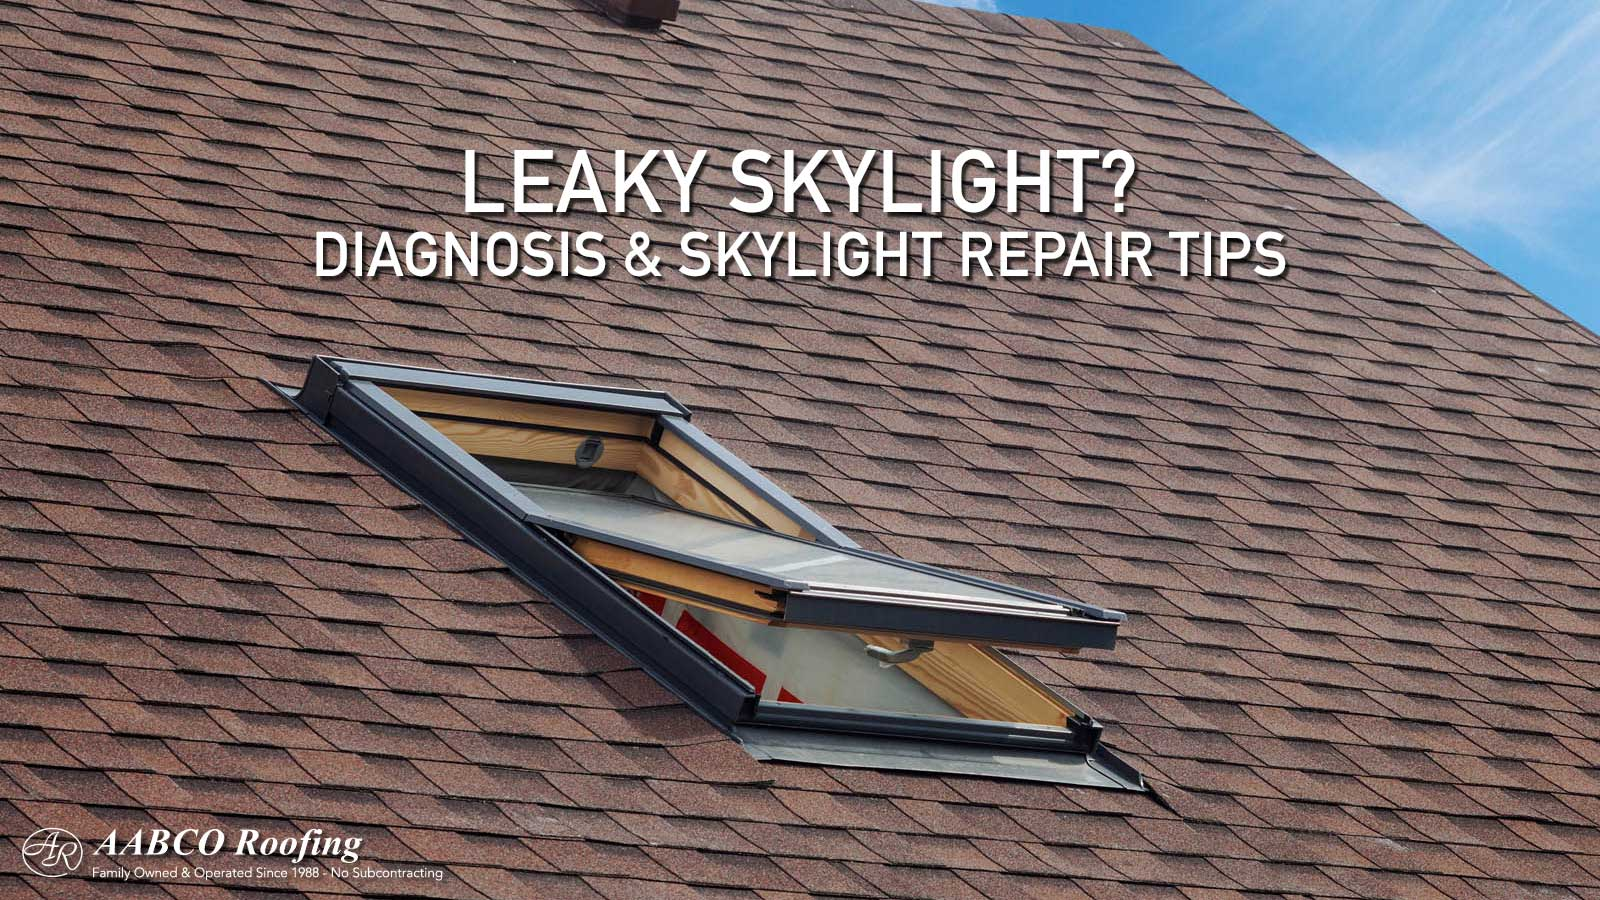 Leaky Skylight